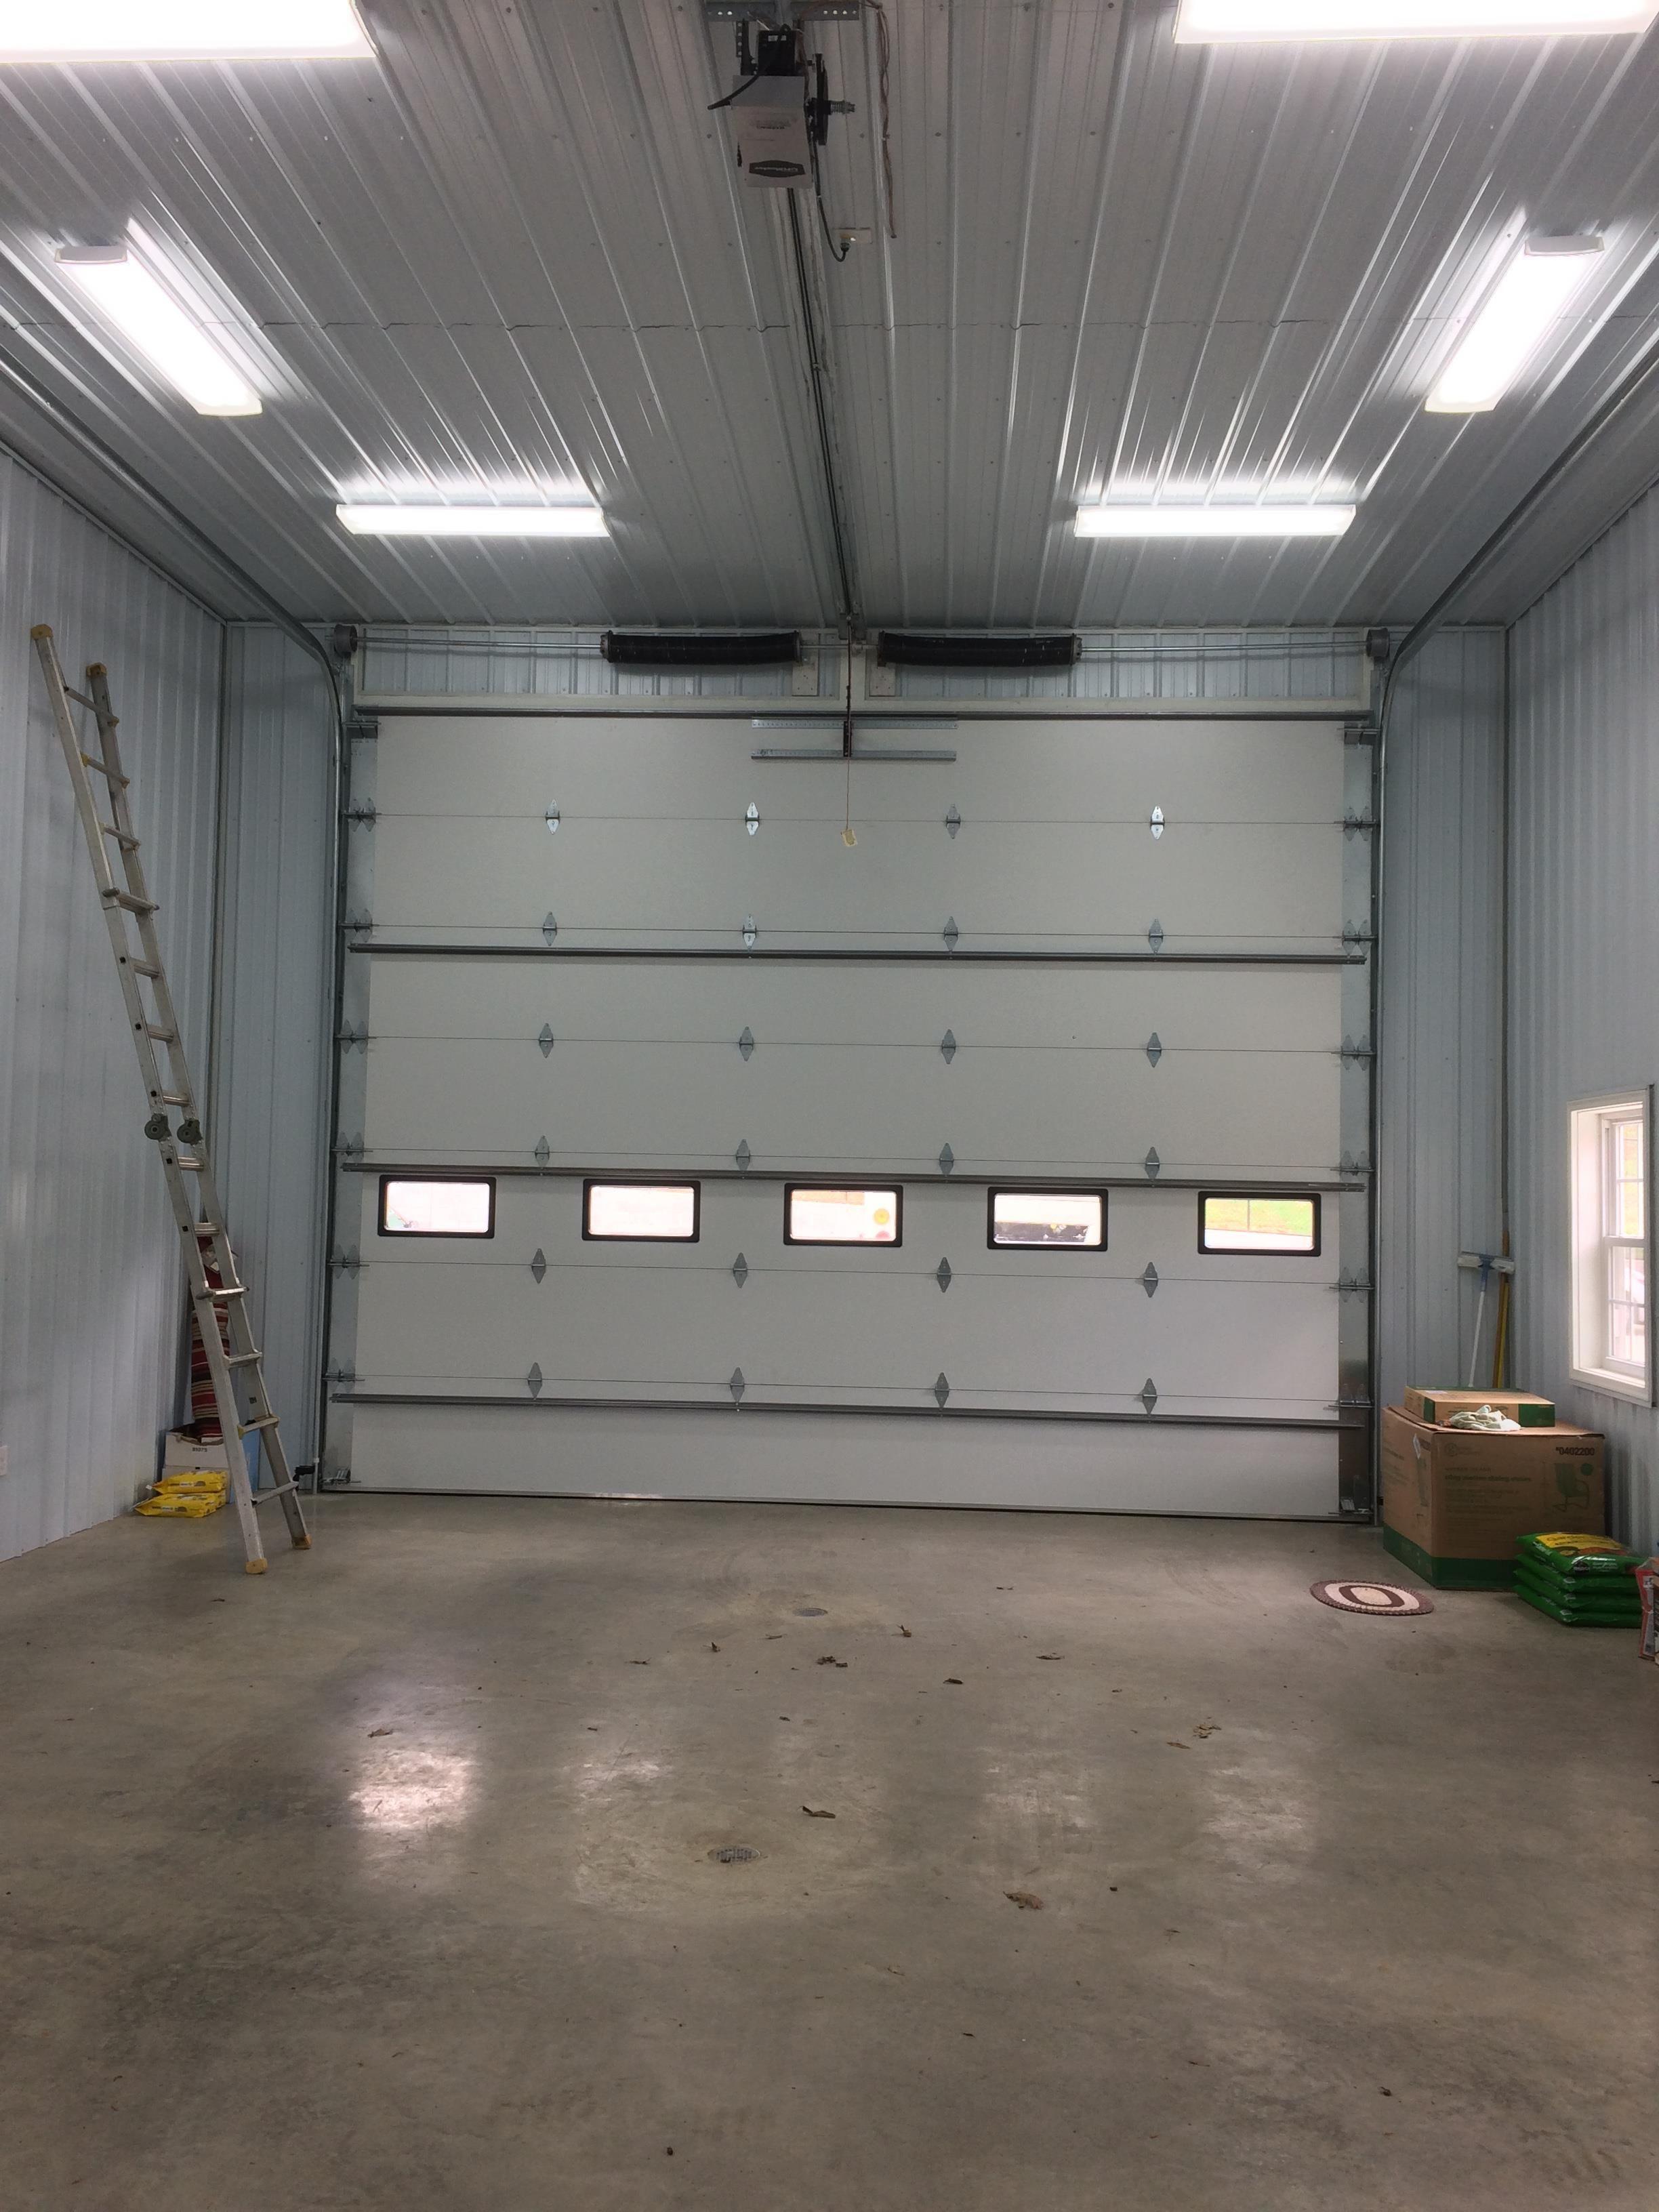 Highland Garage Doors image 6